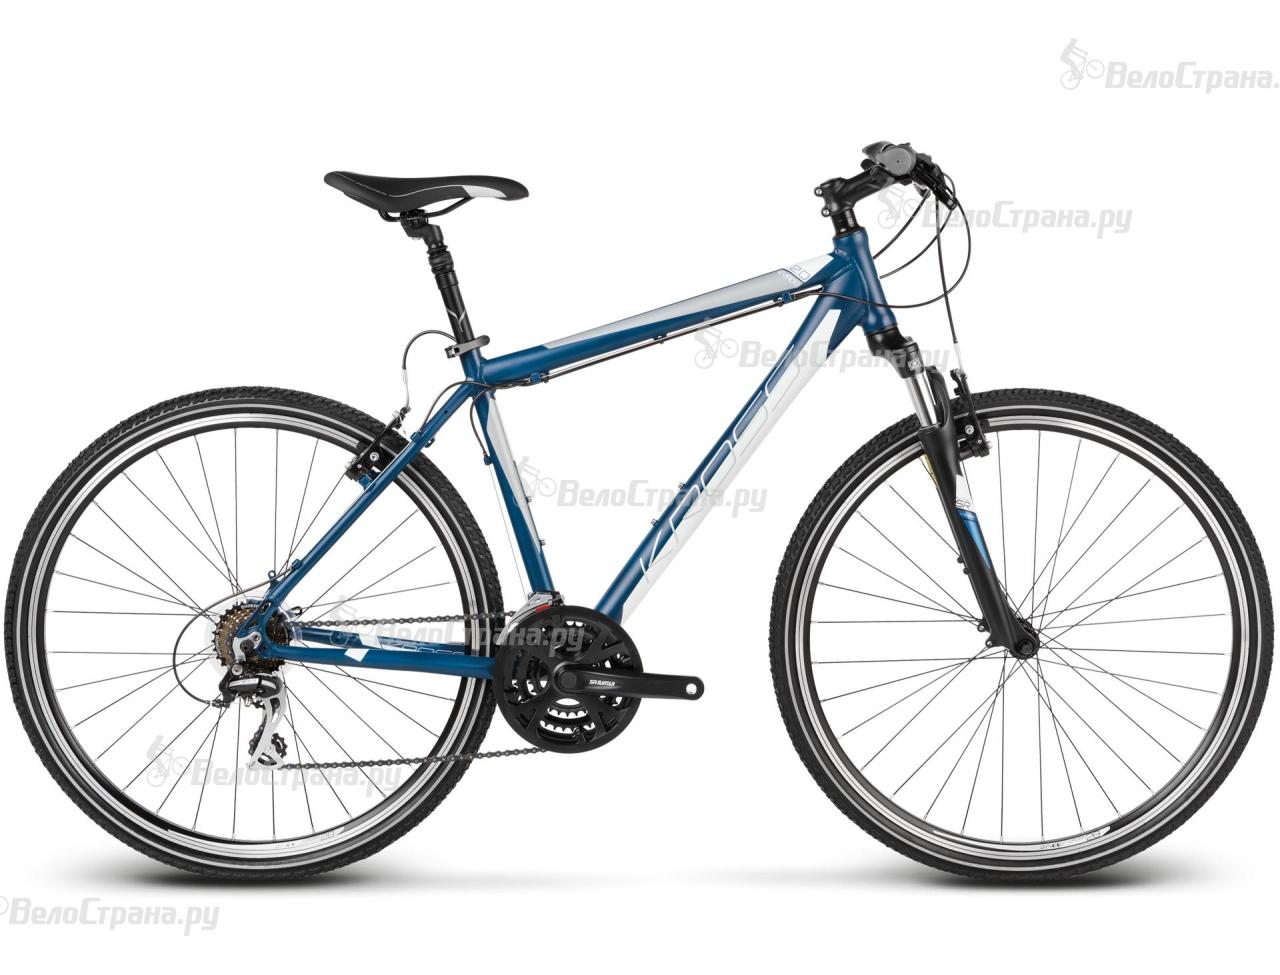 Велосипед Kross Evado 2.0 (2017) велосипед kross lea f2 2017